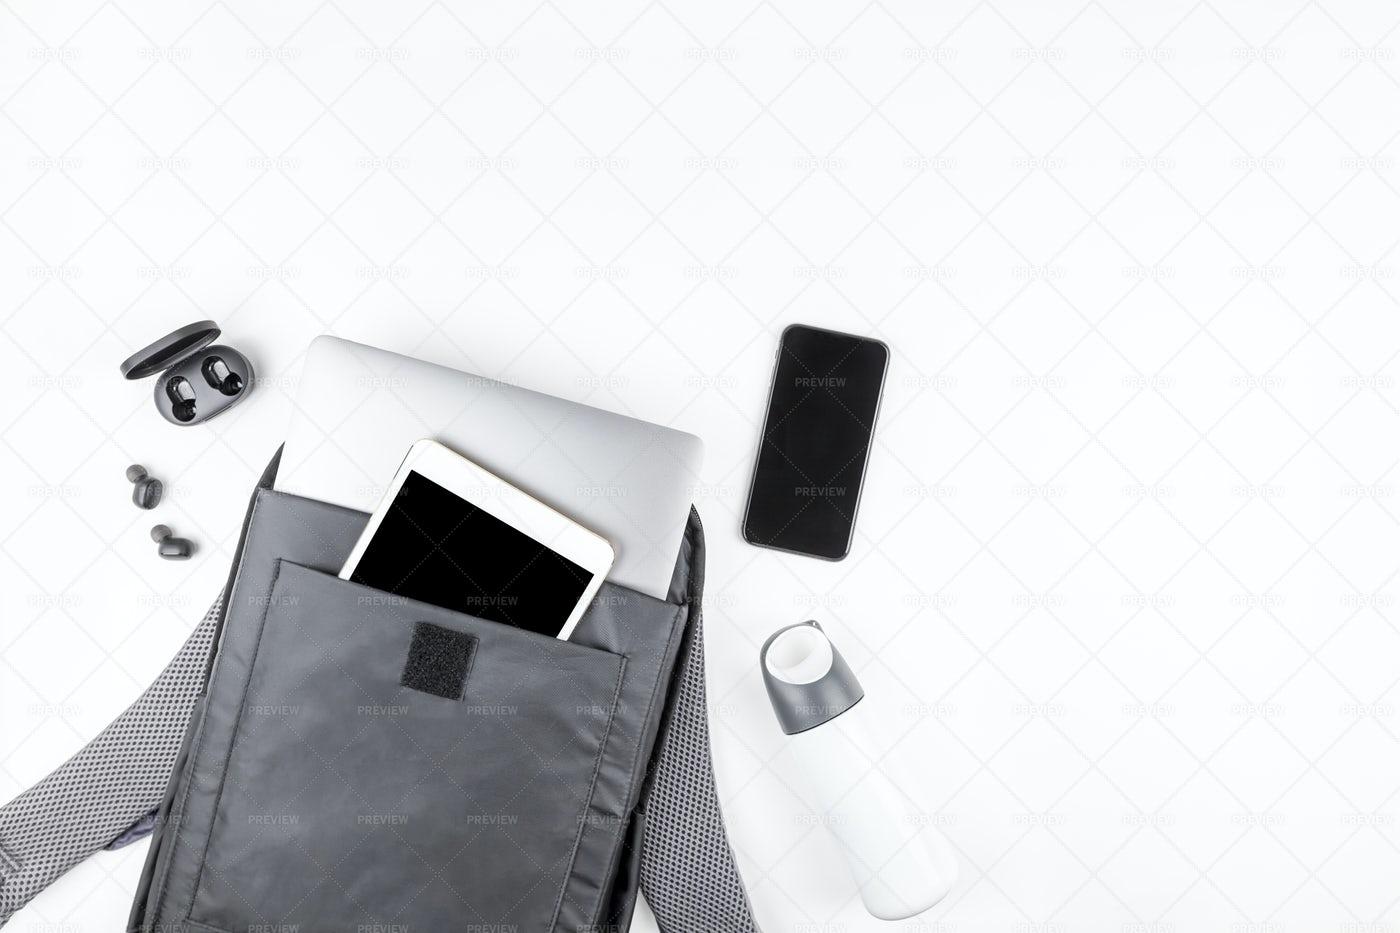 Modern Gadgets Flat Lay: Stock Photos